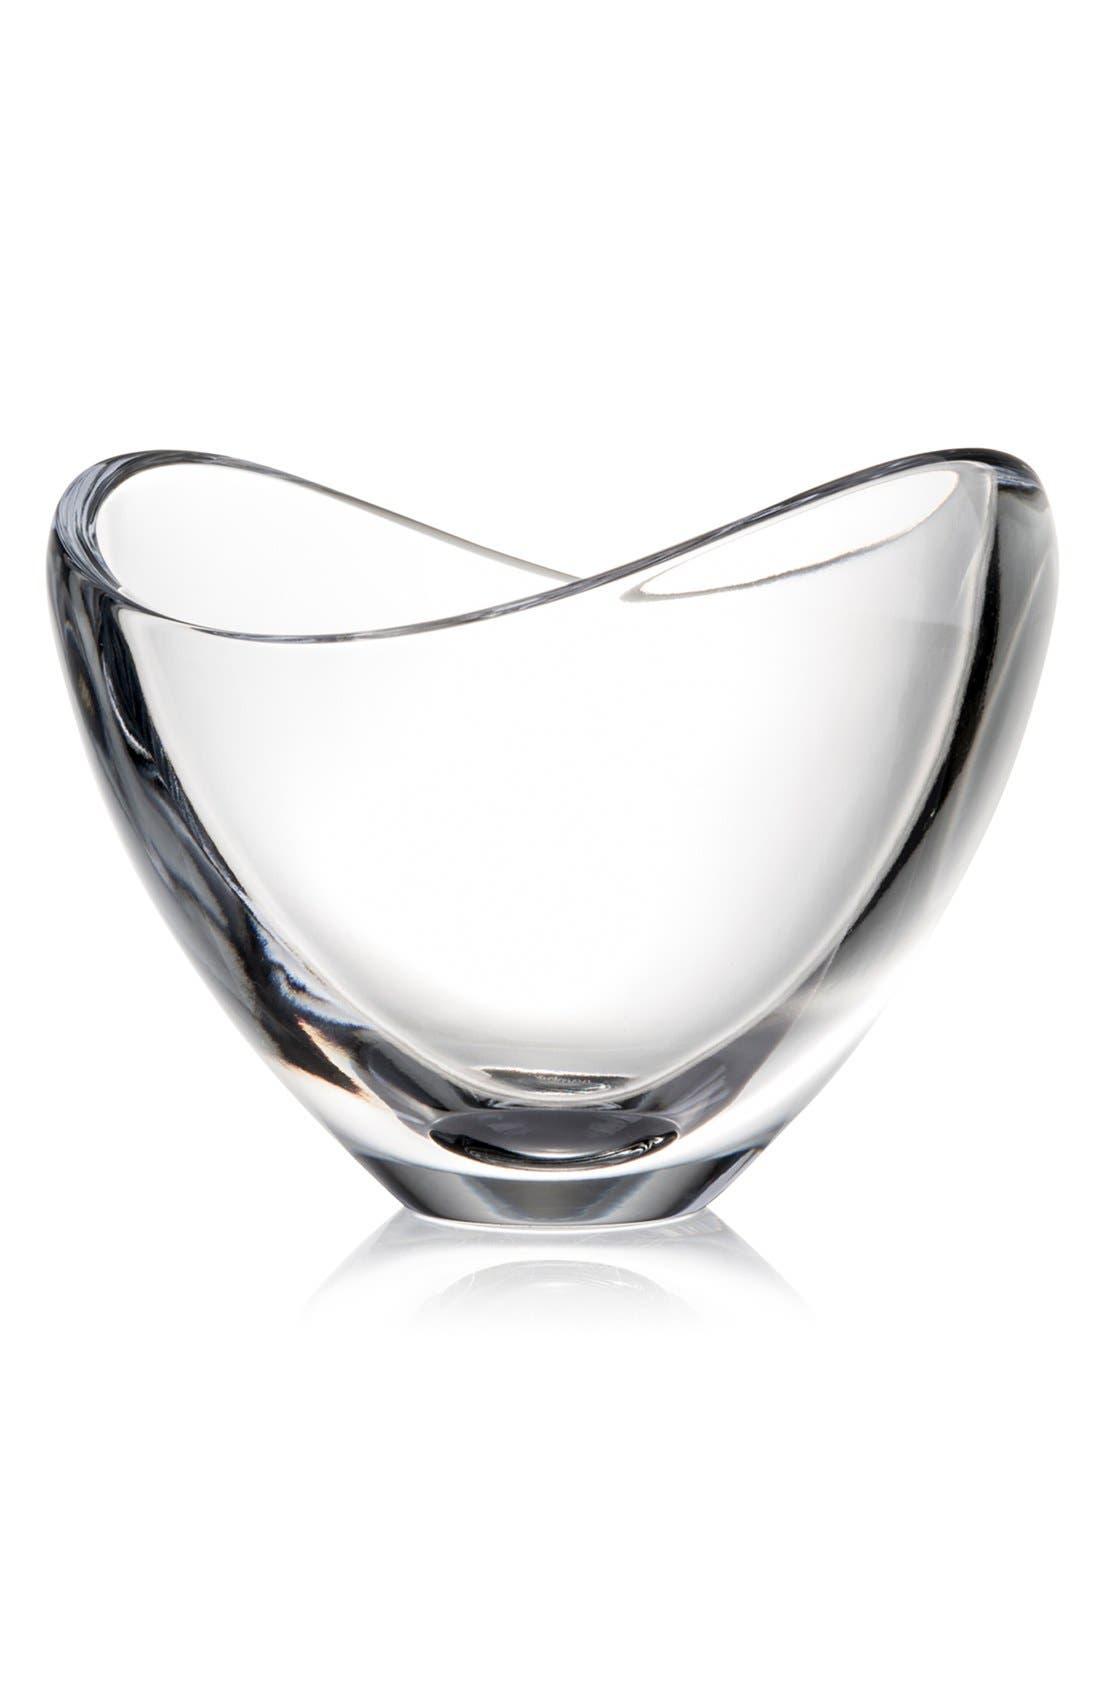 Main Image - Nambé 'Butterfly' Full-Lead Crystal Bowl